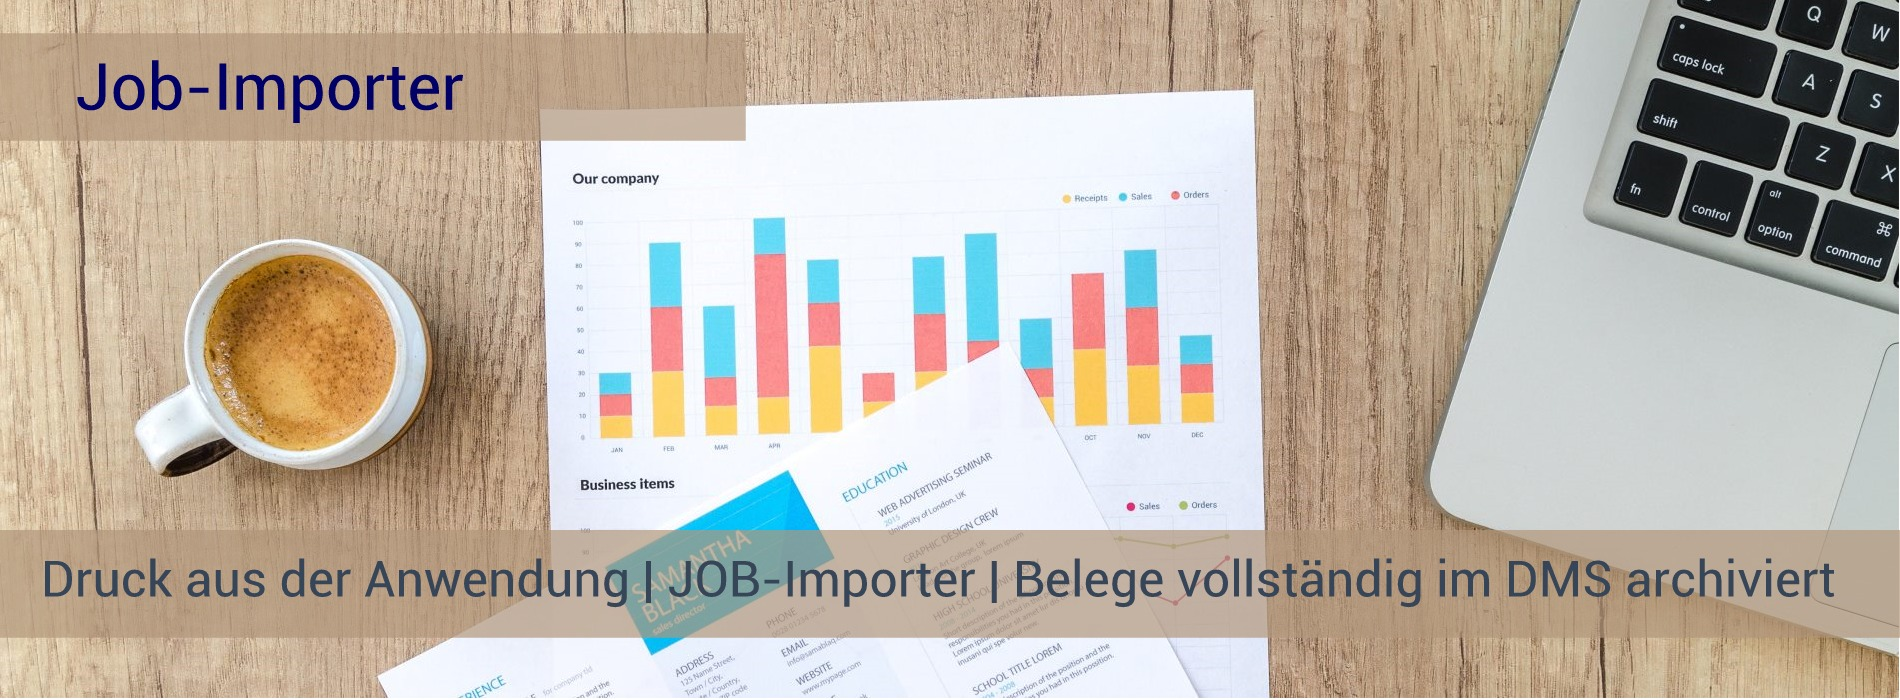 job-importer-1